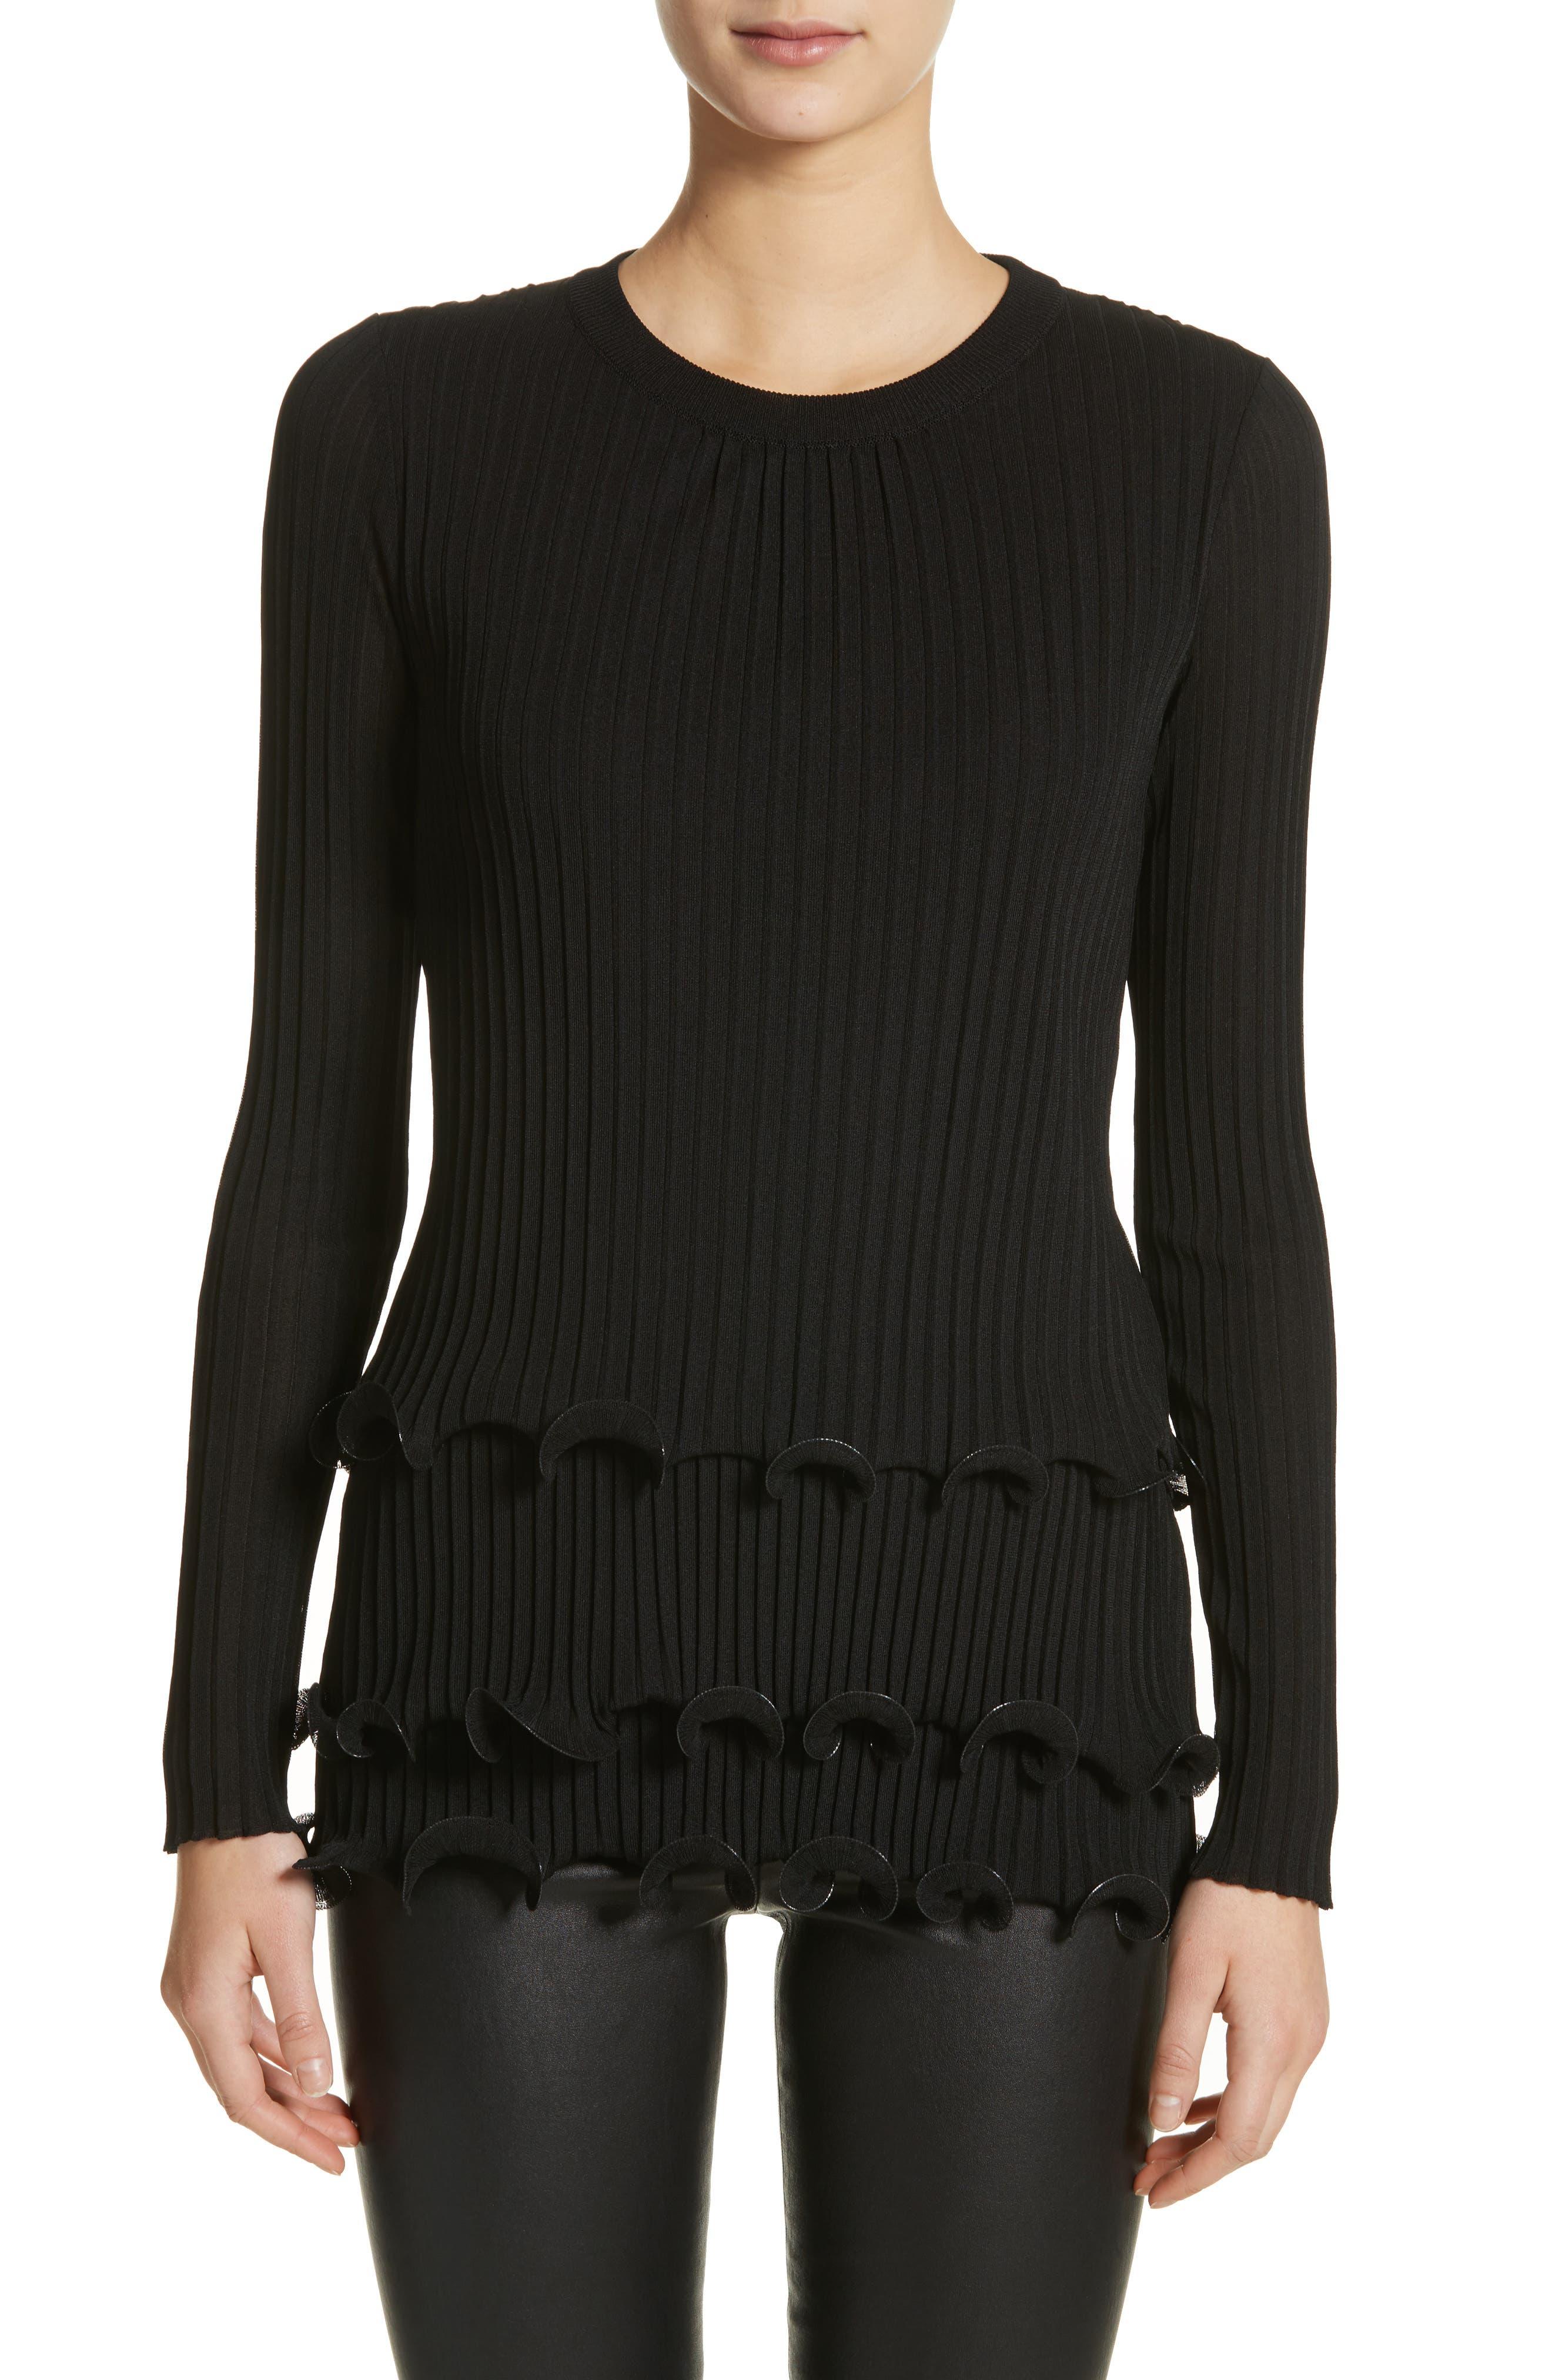 Alternate Image 1 Selected - Givenchy Ruffle Hem Rib Knit Top